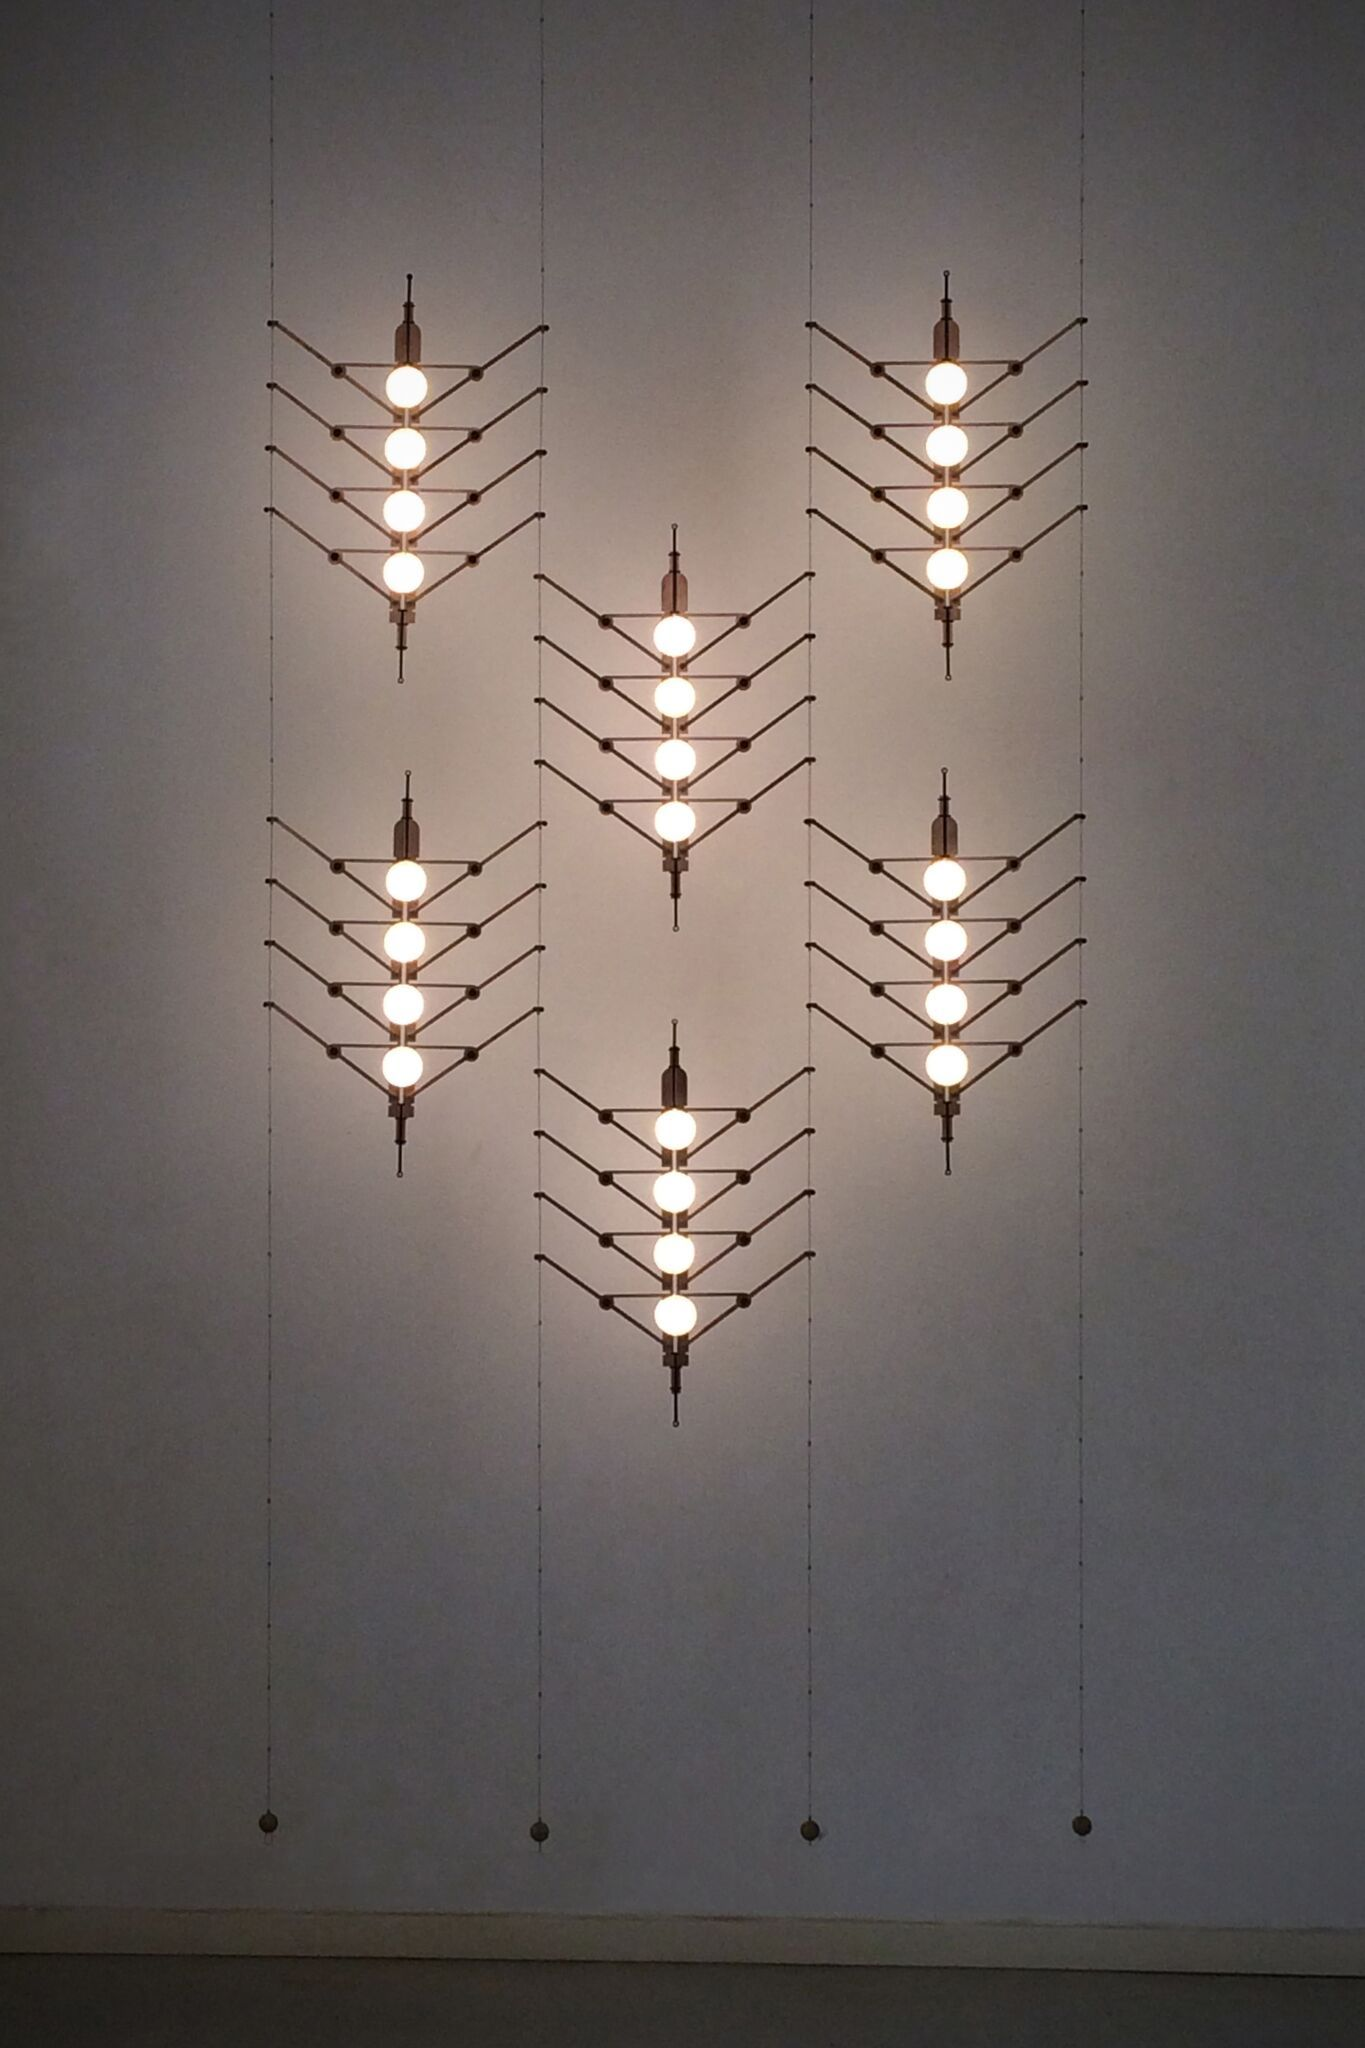 Vantot J Smeopa Lighting Design Interior Office Wall Design Cool Lighting